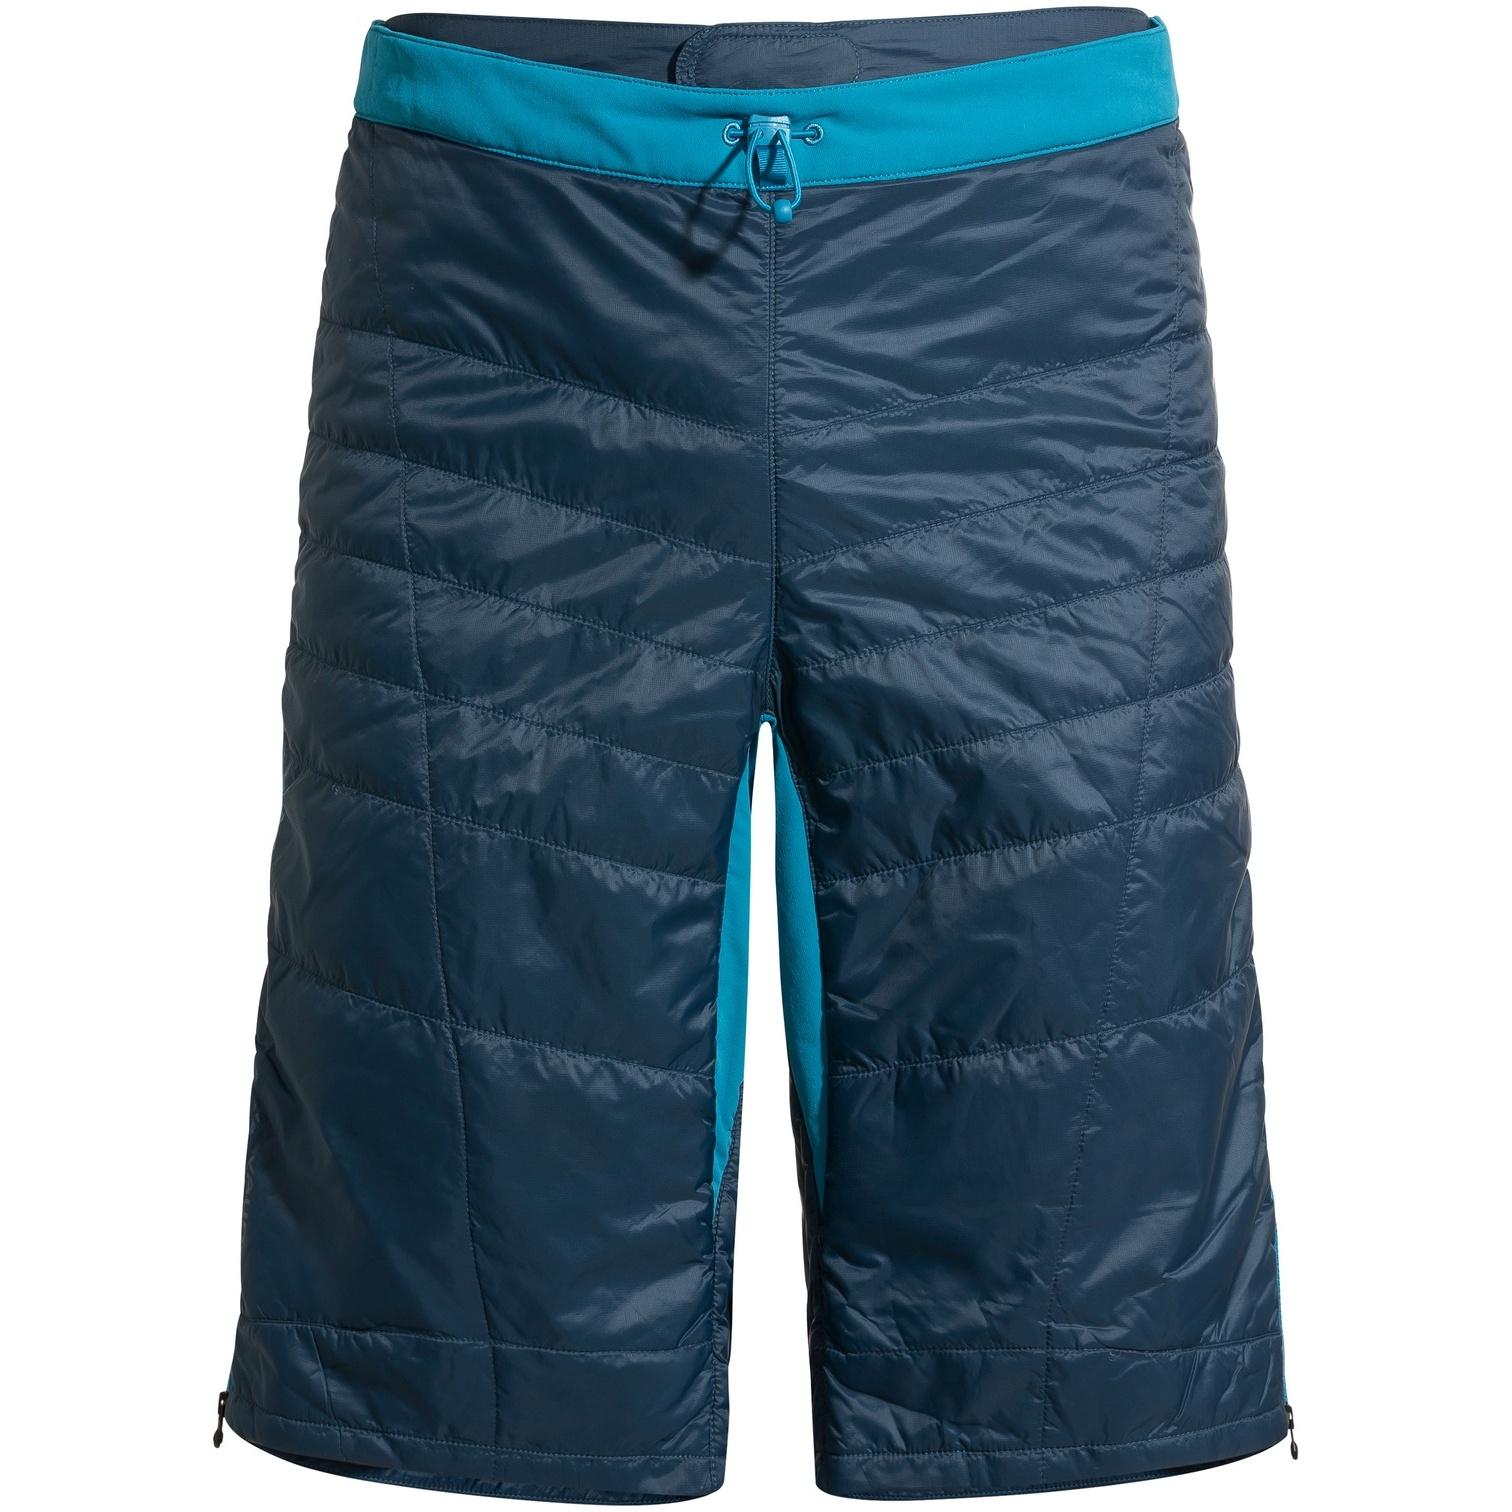 Image of Vaude Men's Sesvenna Shorts II - baltic sea